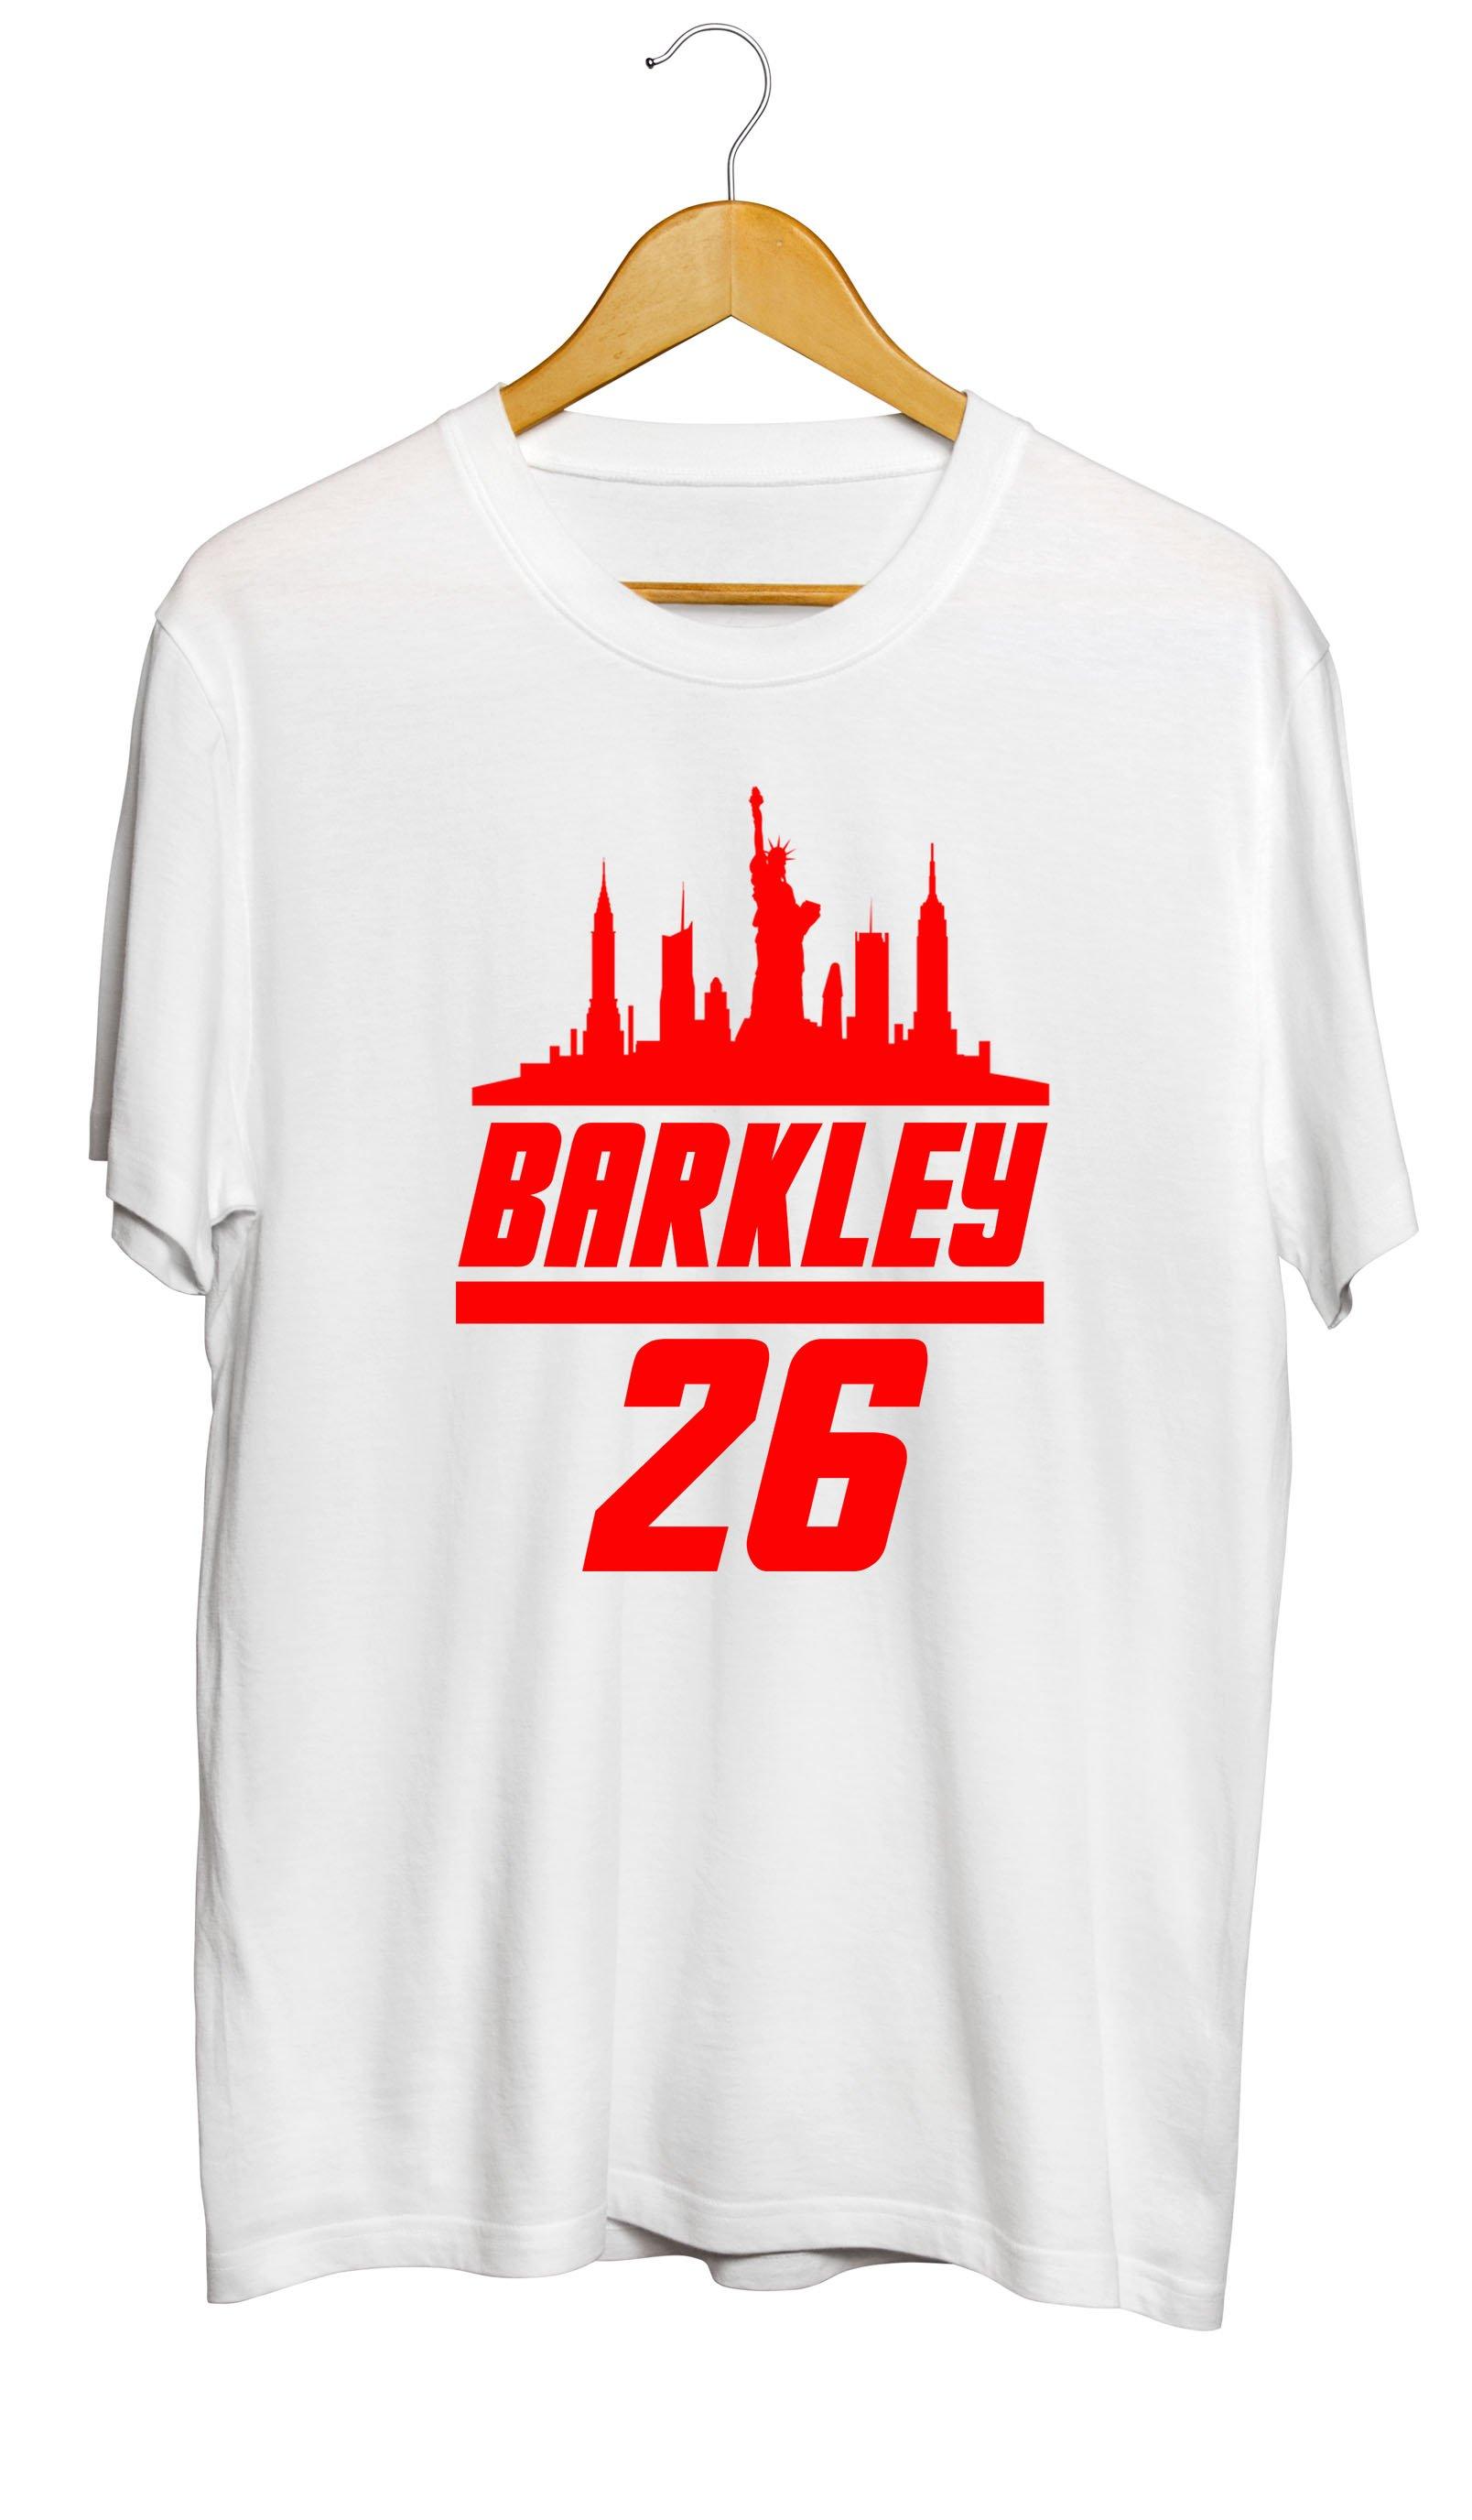 hot sale online 7fa91 e267e Saquon Barkley | Giants T-Shirt | Saquon Barkley | New York ...